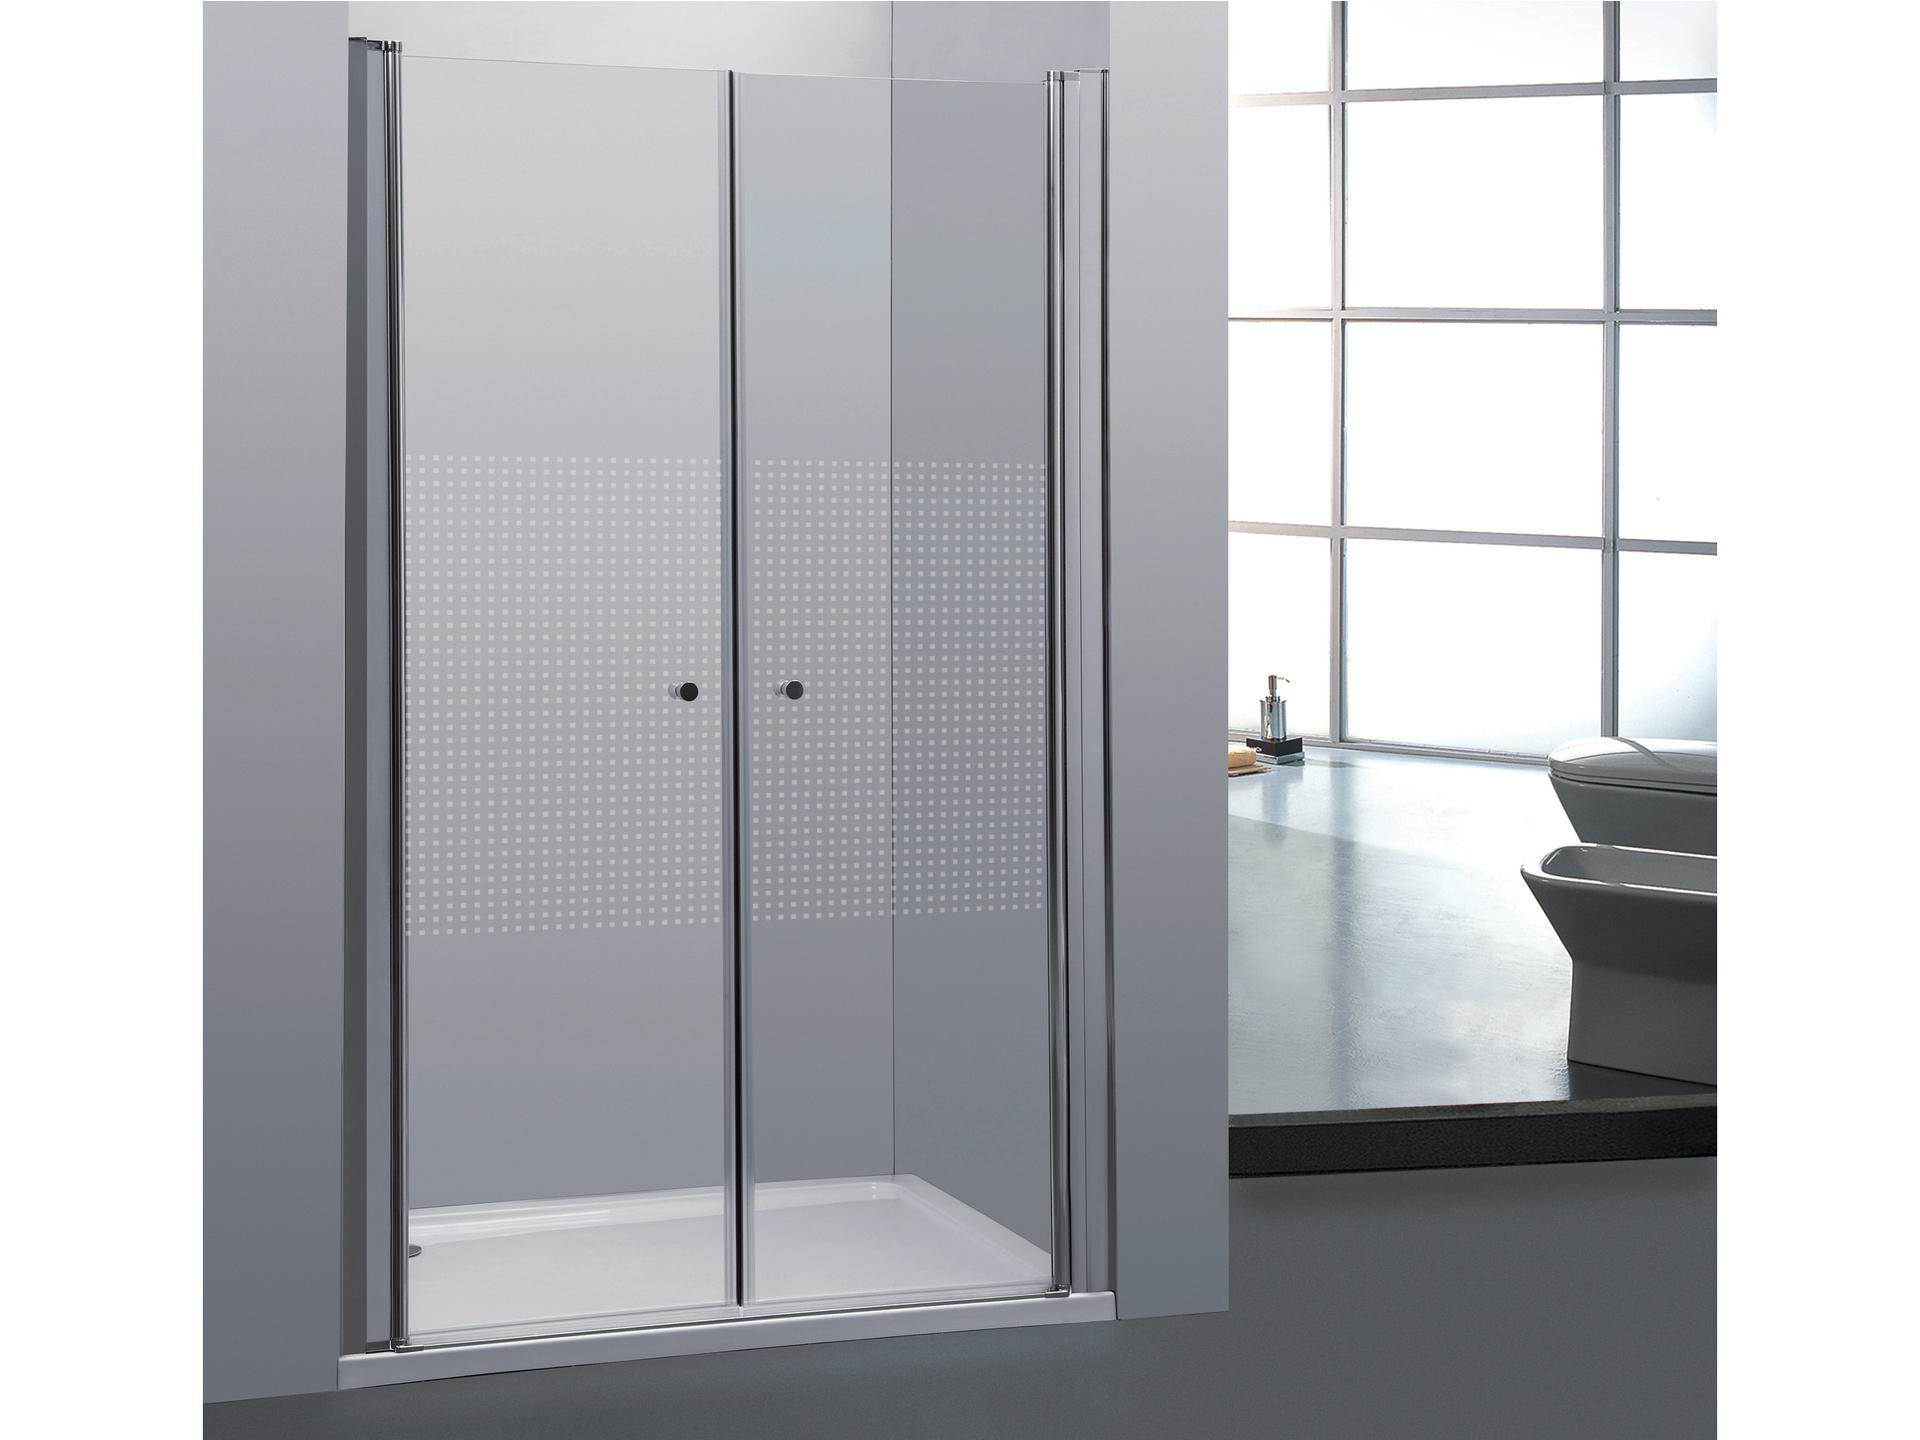 Allibert Priva porte de douche pivotante 90x190 cm 2 portes sérigraphie  horizontale   Hubo 99a05ff9e48